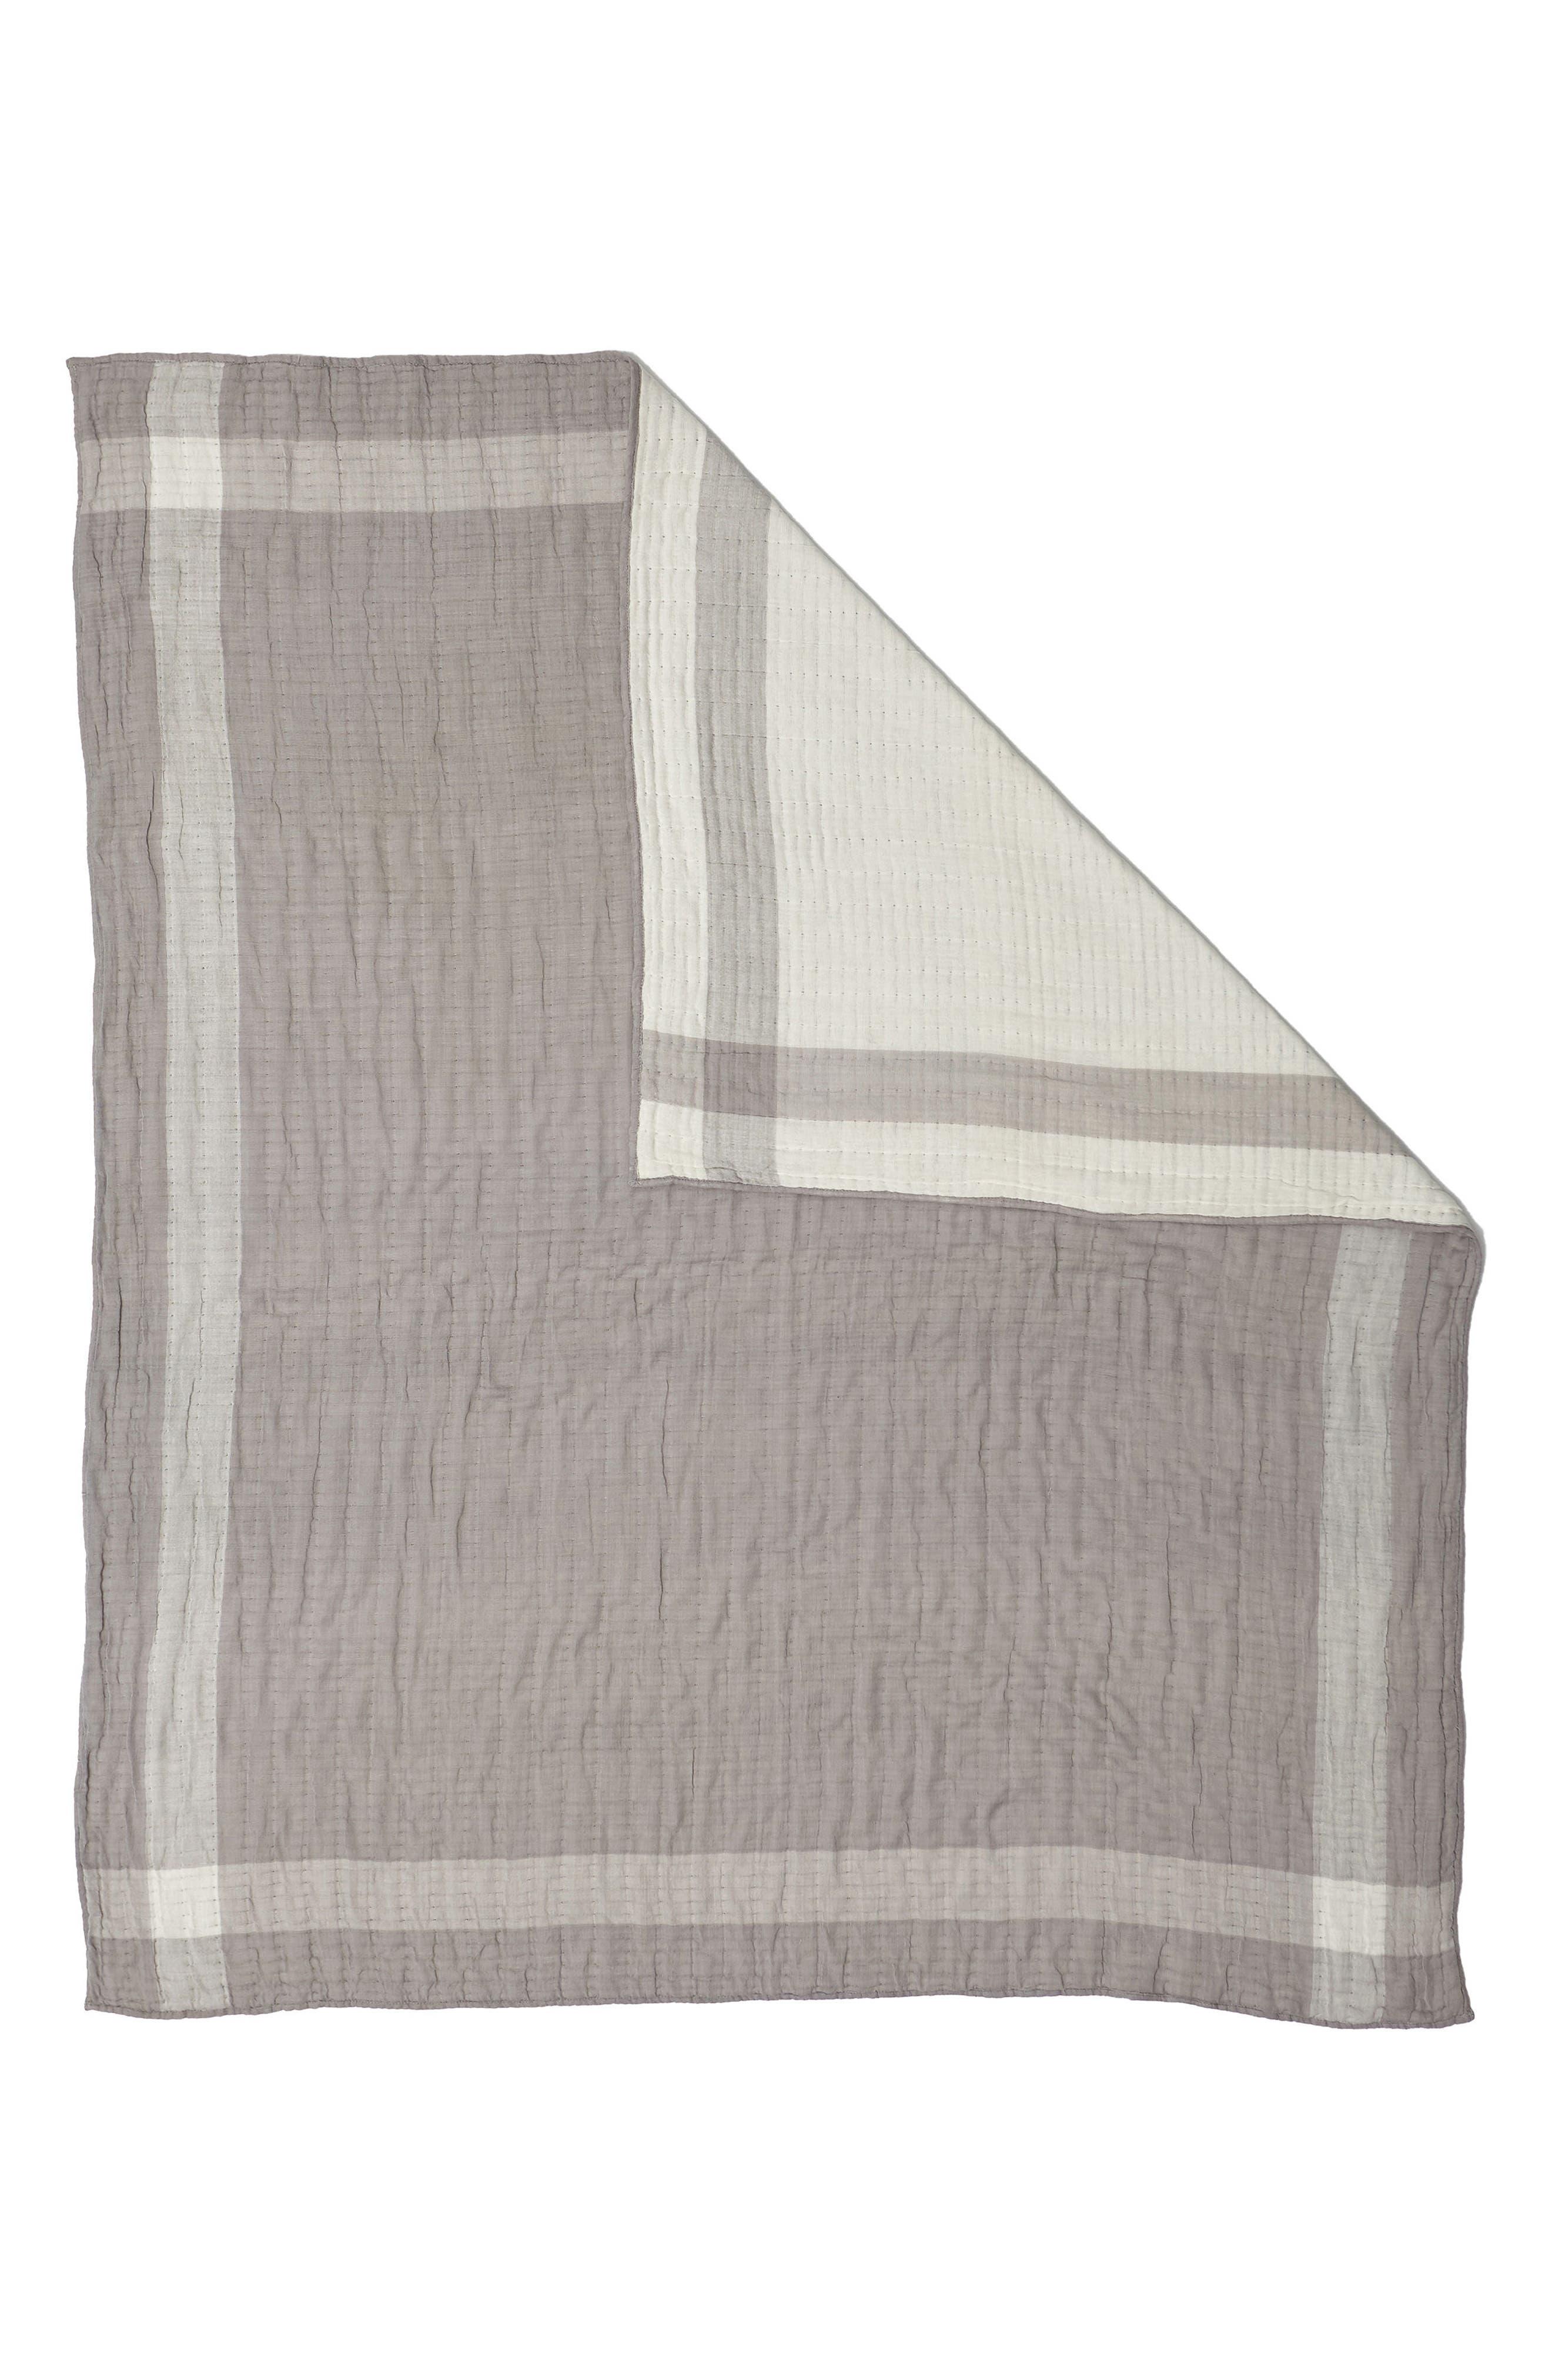 Sidekick Blanket,                             Main thumbnail 1, color,                             020